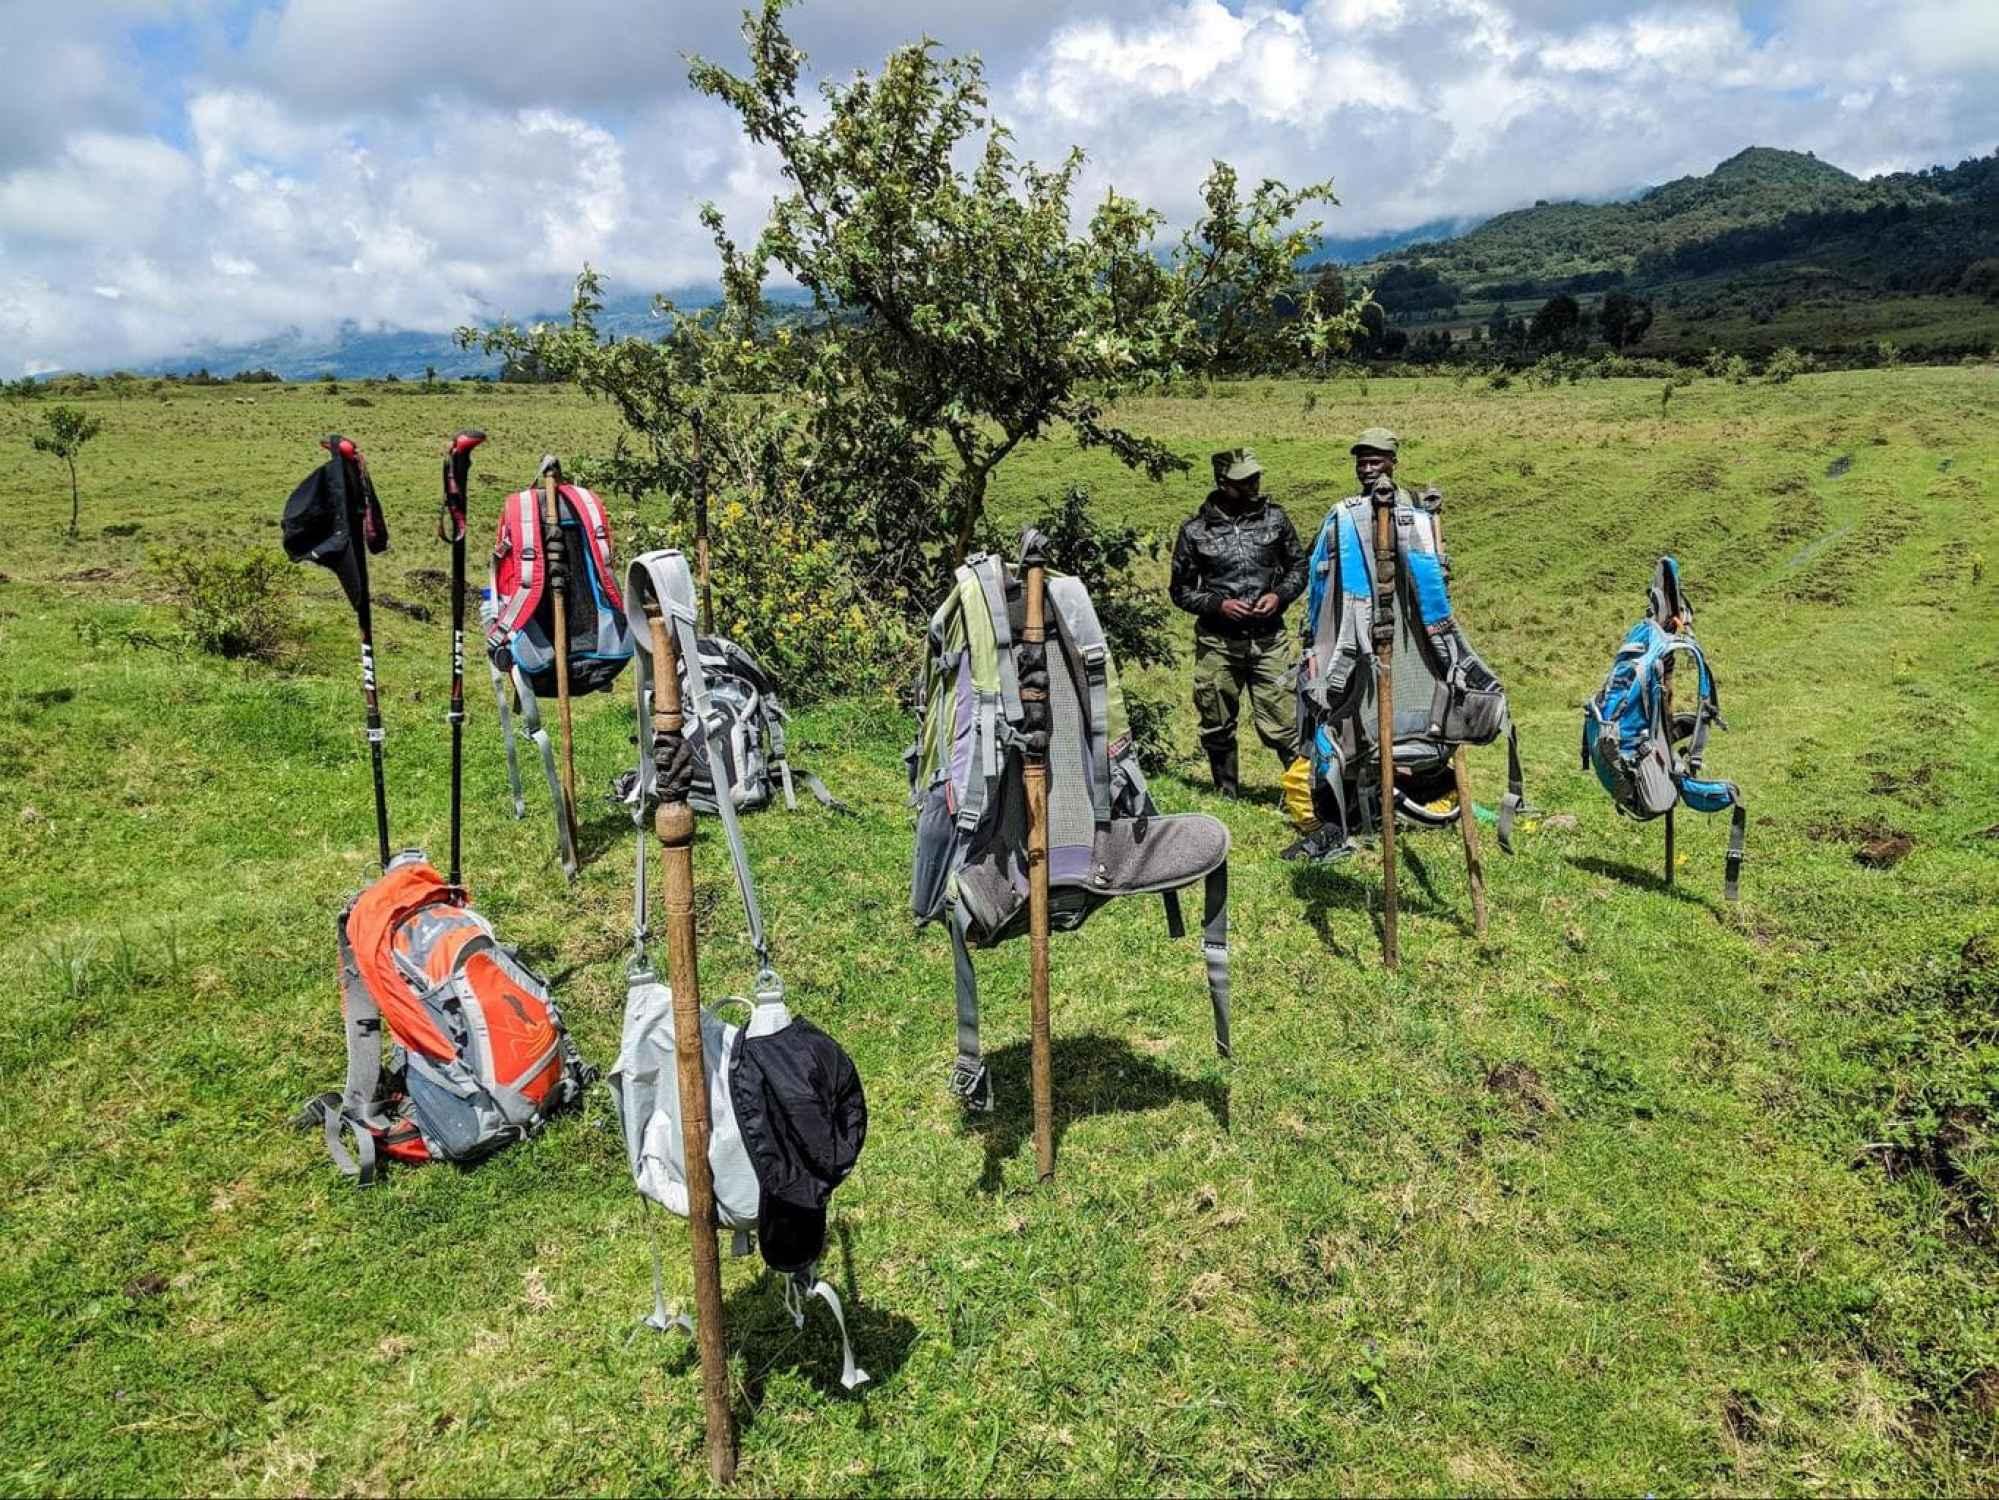 The backpacks worn by my gorilla trekking group